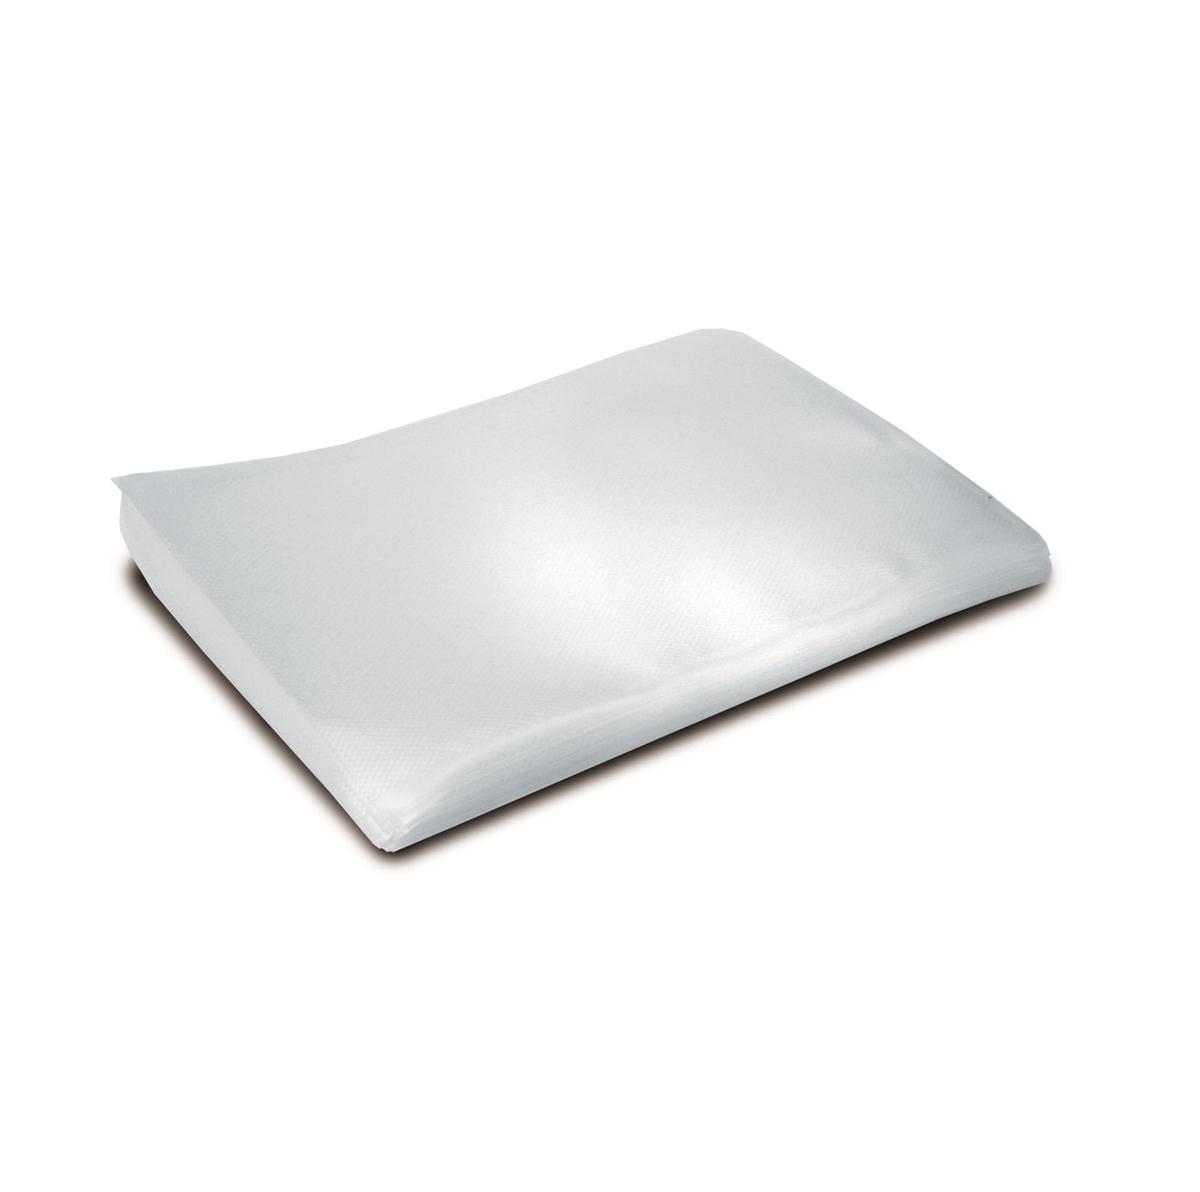 Bags 20x30cm, 50 pcs